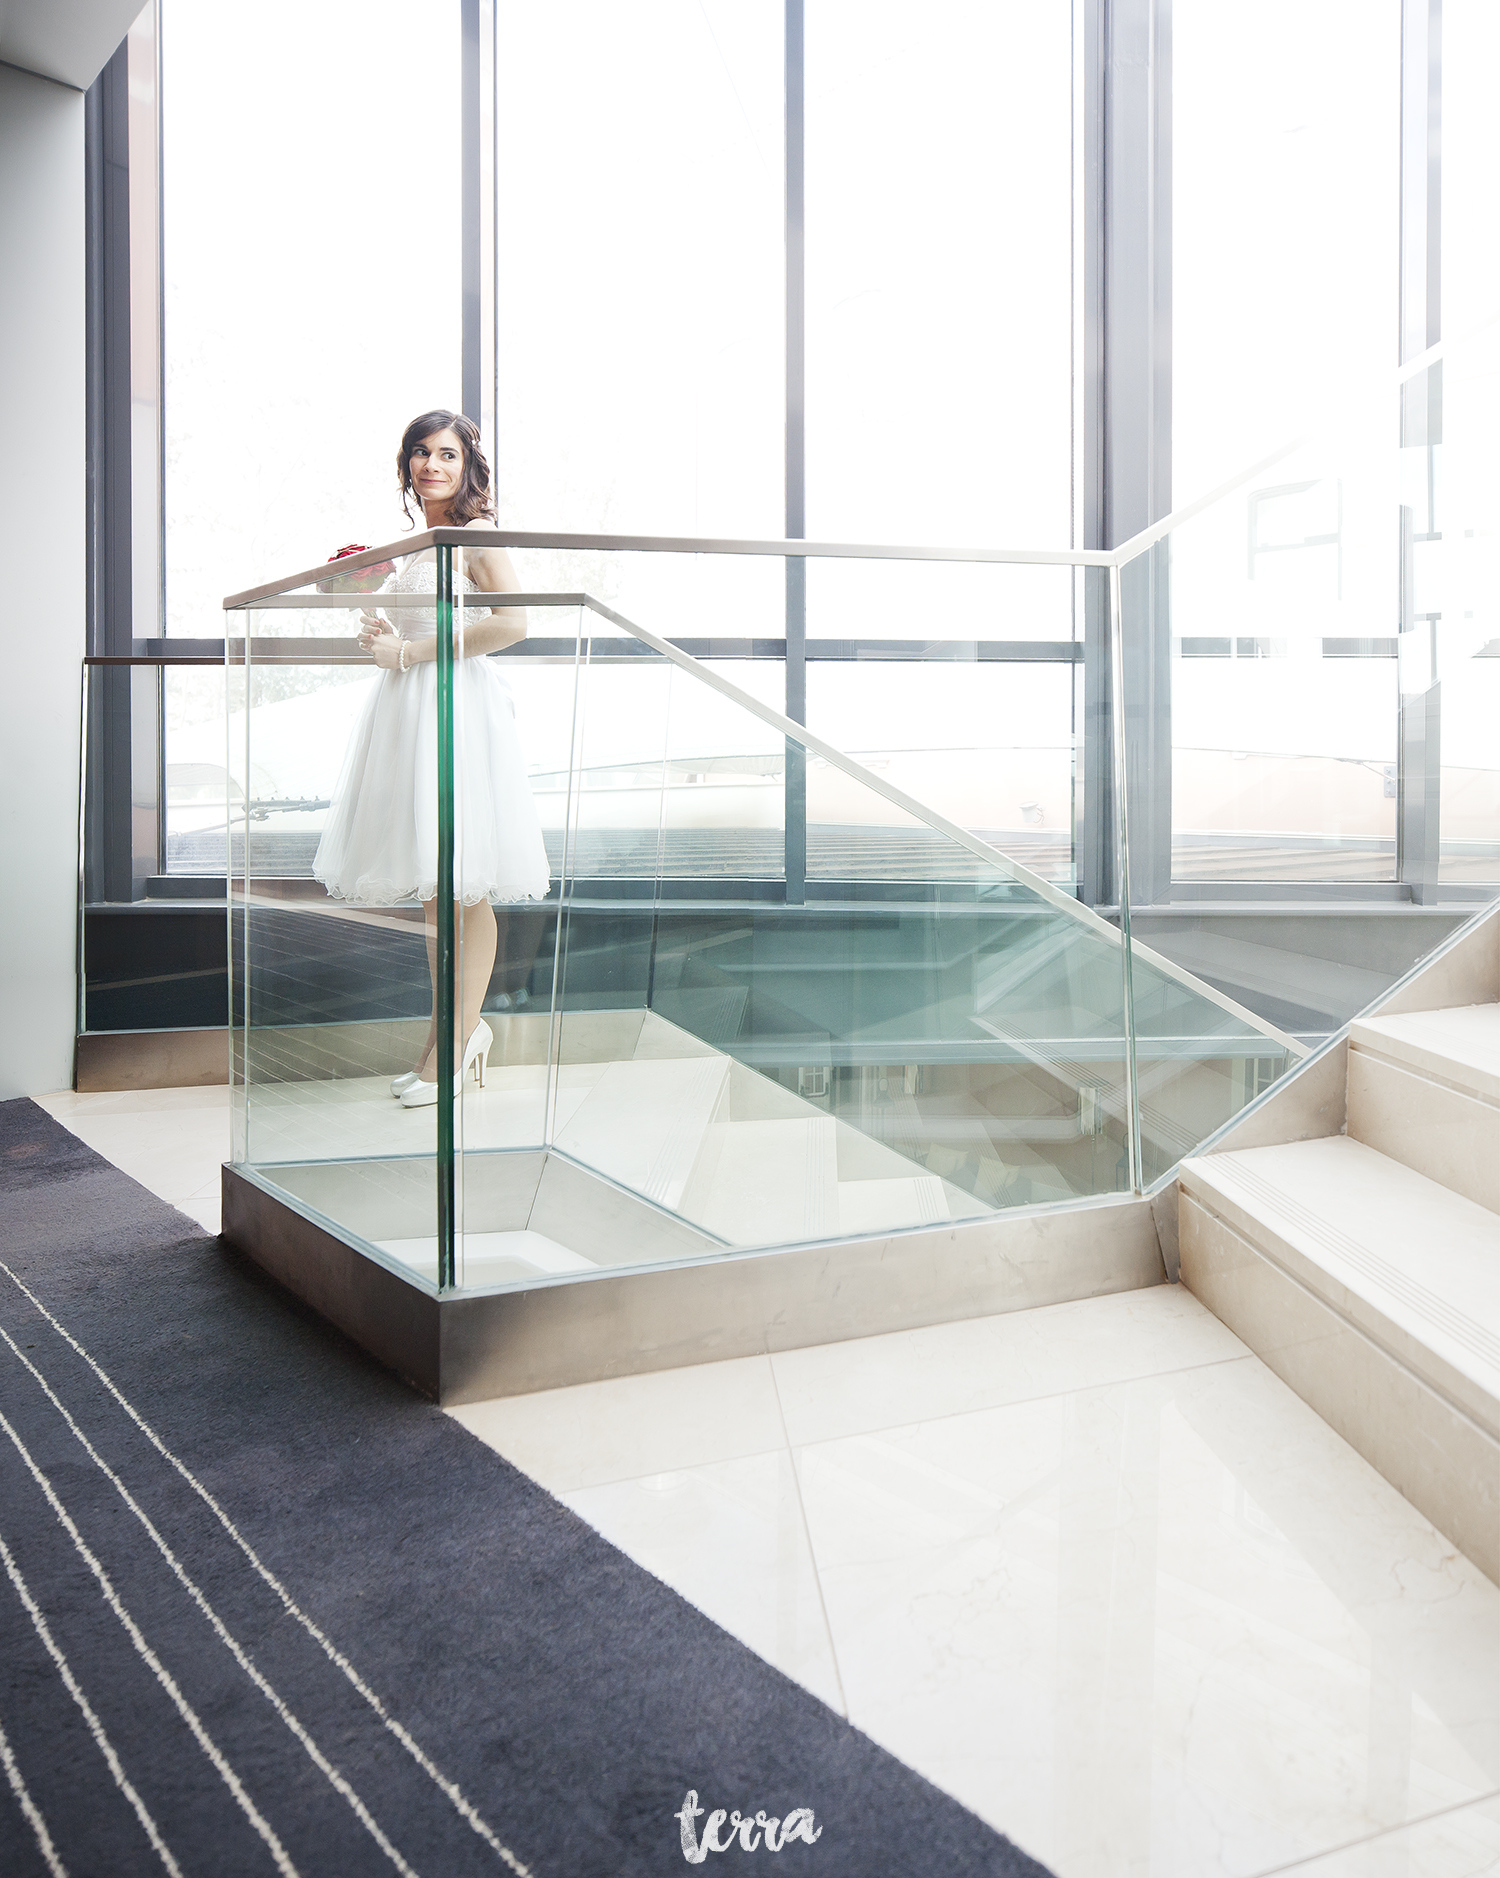 casamento-monte-real-termas-hotel-spa-terra-fotografia-0009.jpg